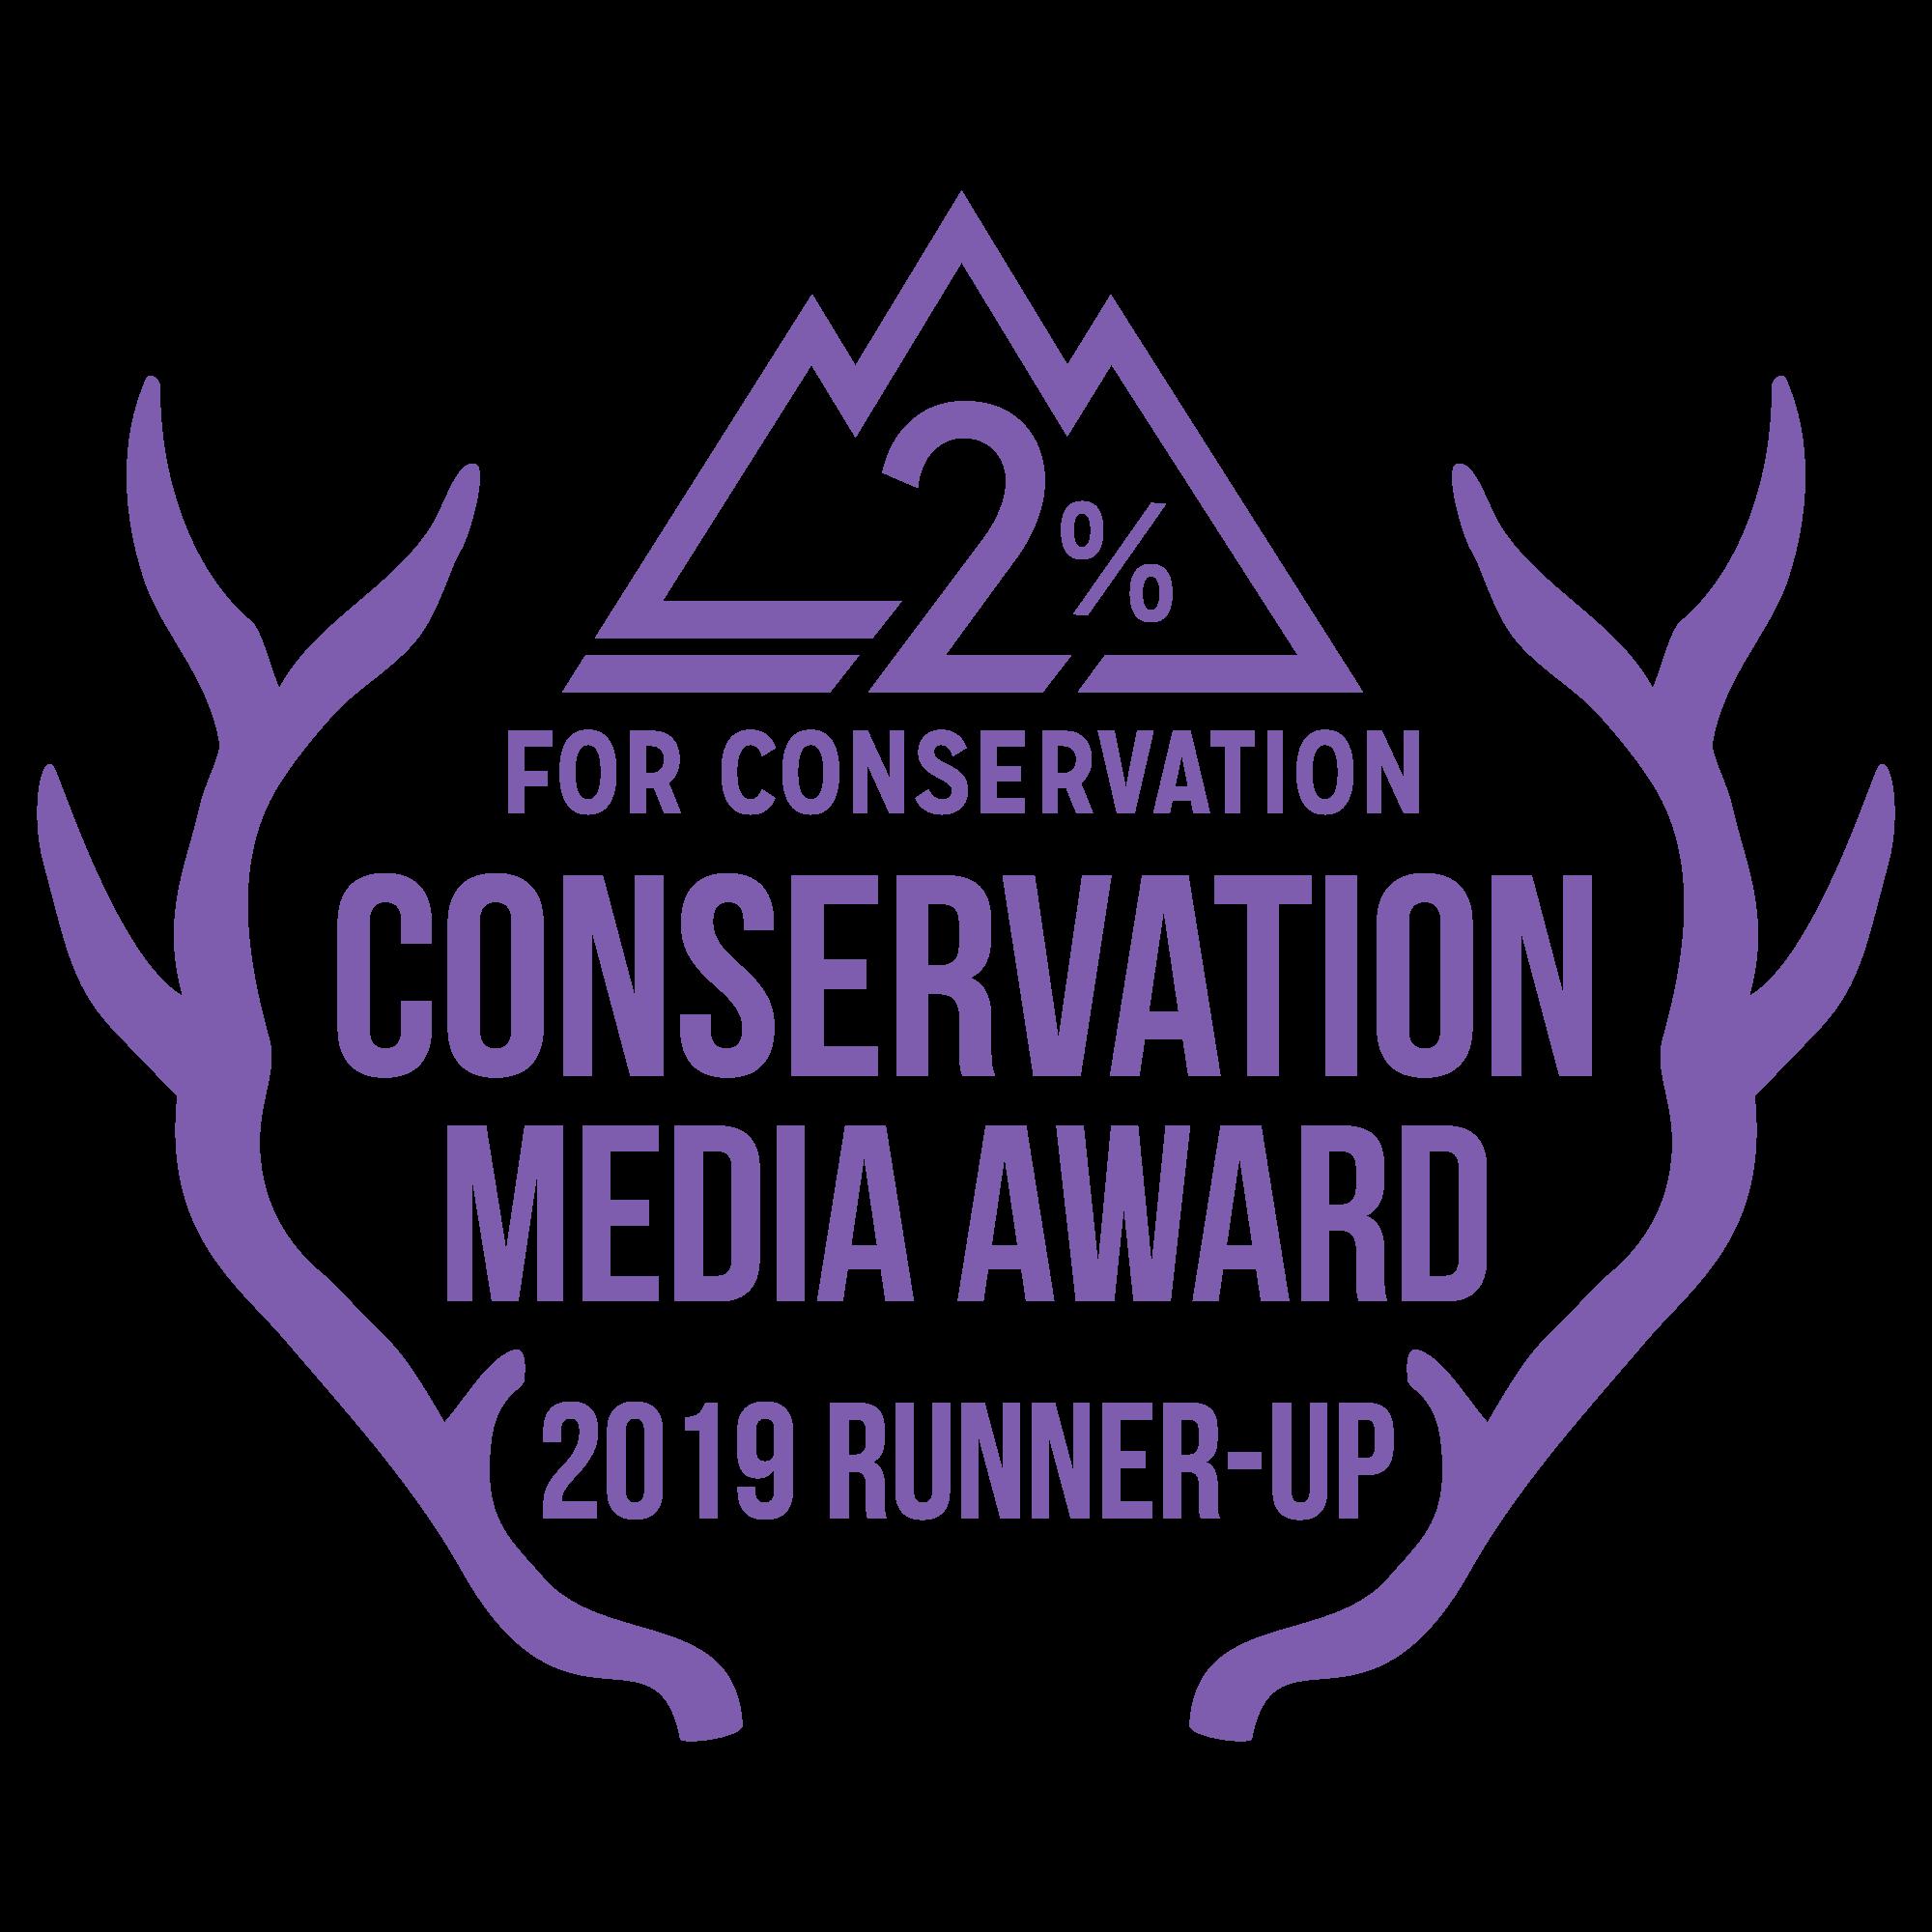 Media-Award-Logo-Purple.png